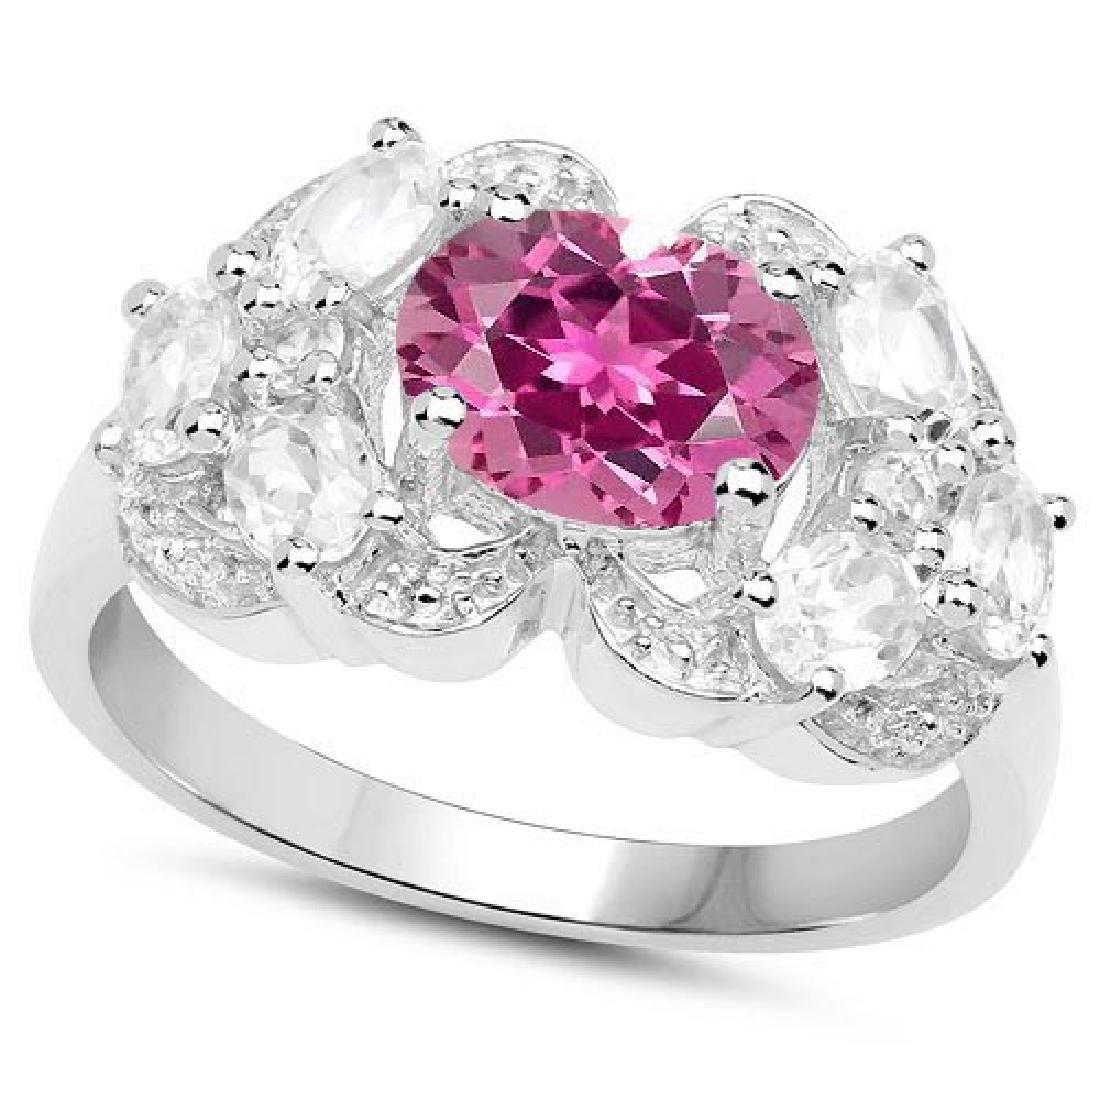 Certified 1.10 Ctw. Genuine Pink tourmaline And Diamond